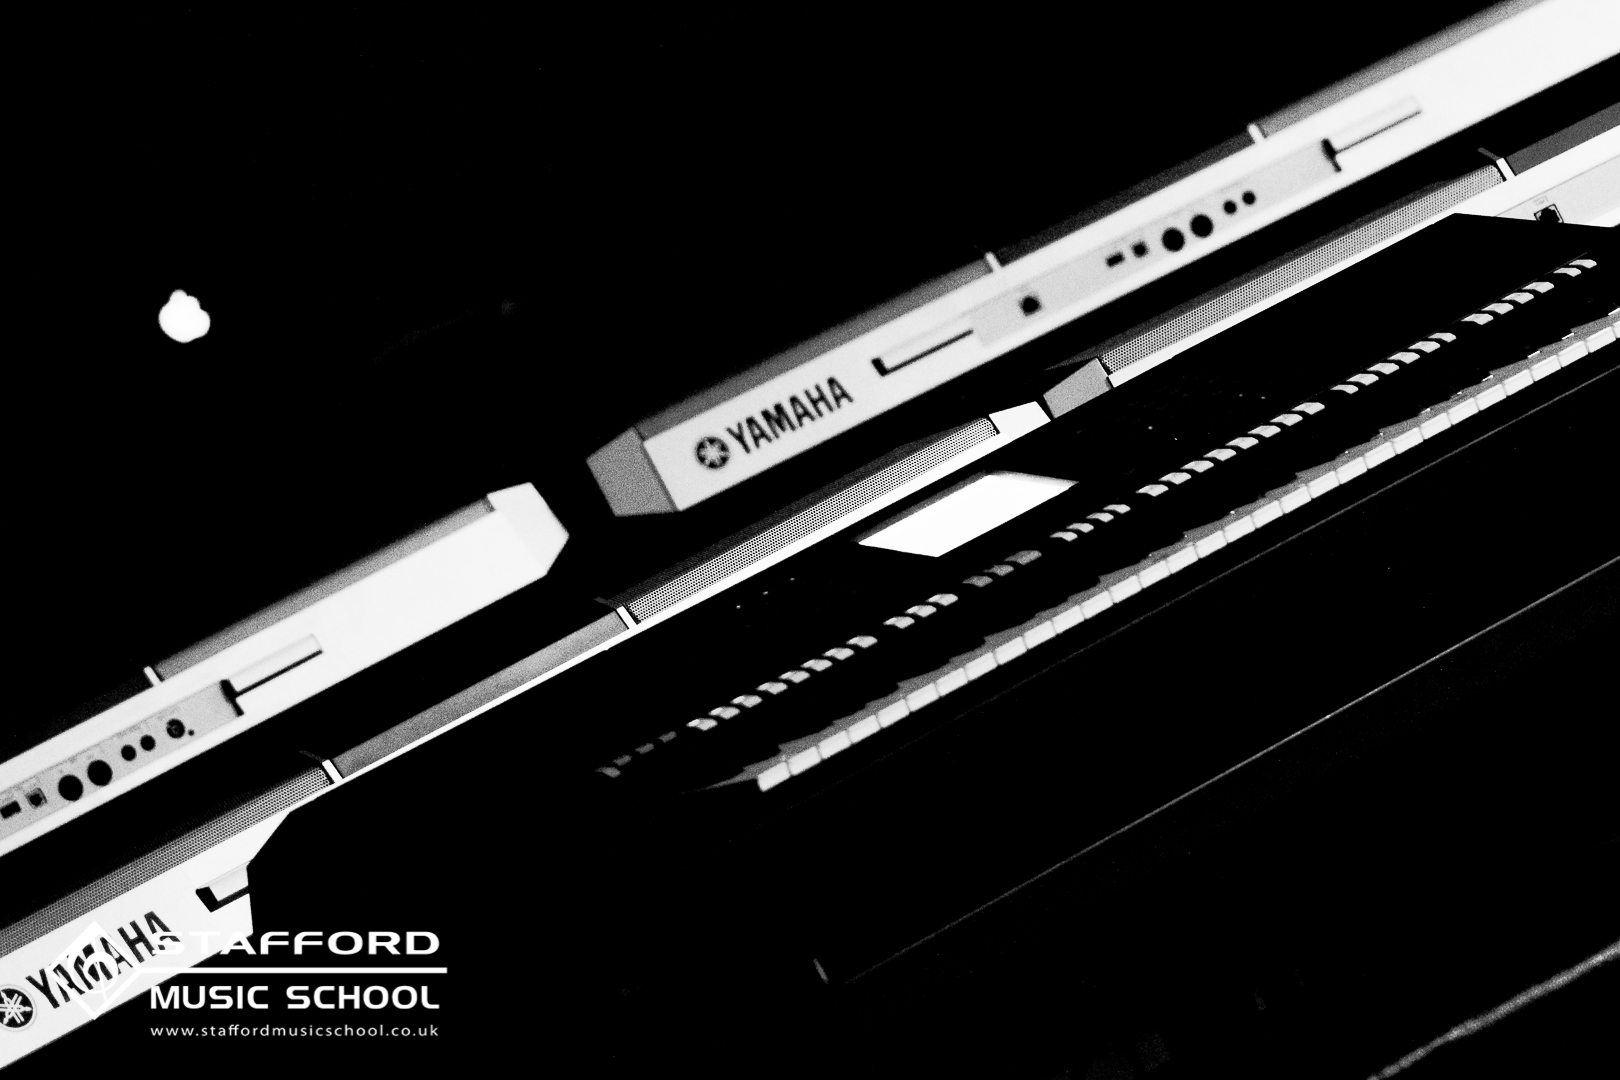 StaffordMS-9750.jpg